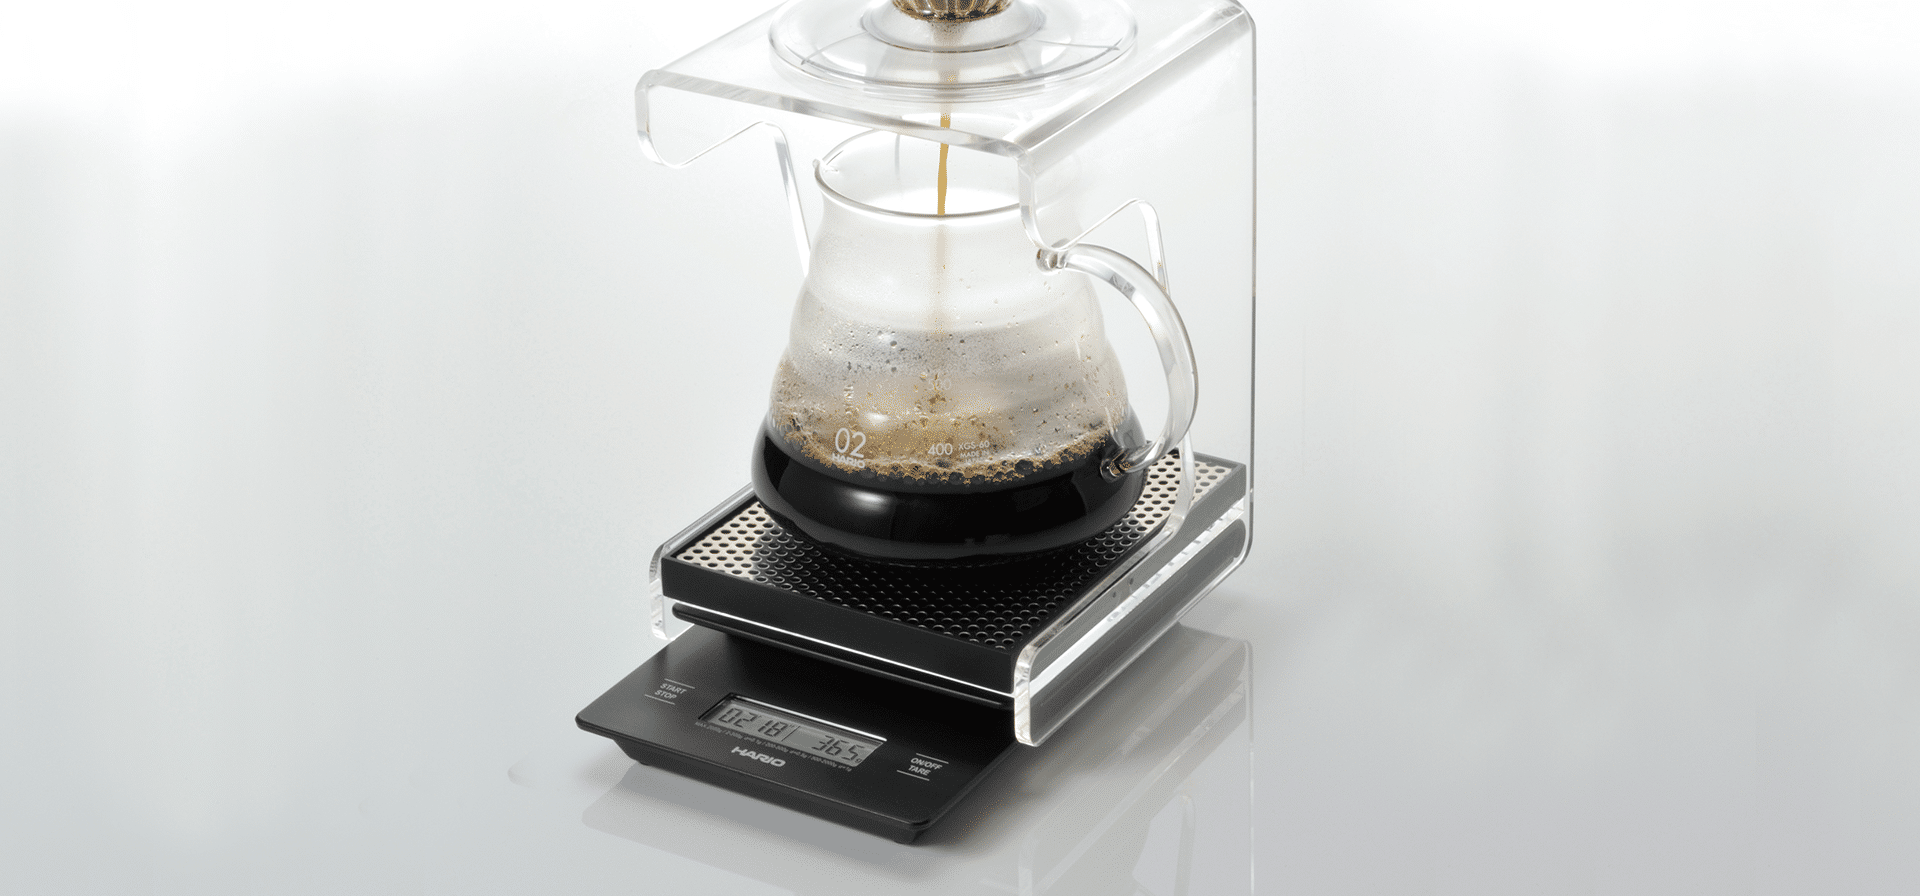 Hario Drip Coffee Scale